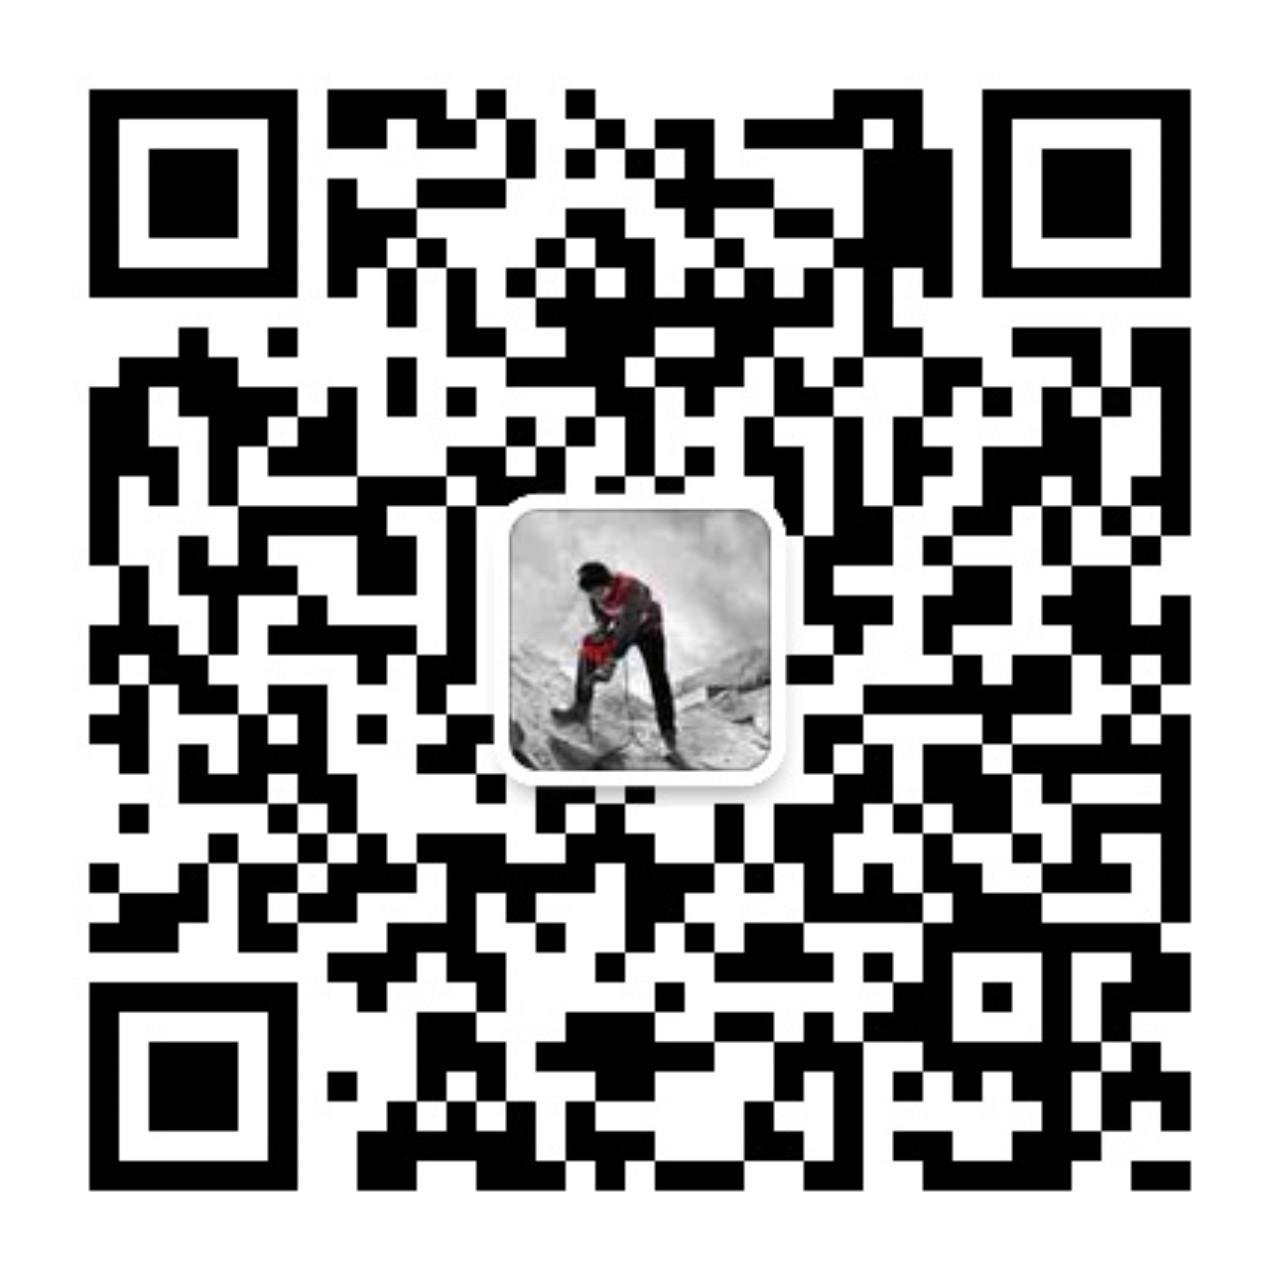 a7579abb-02e5-4443-9141-696b30b58e5c